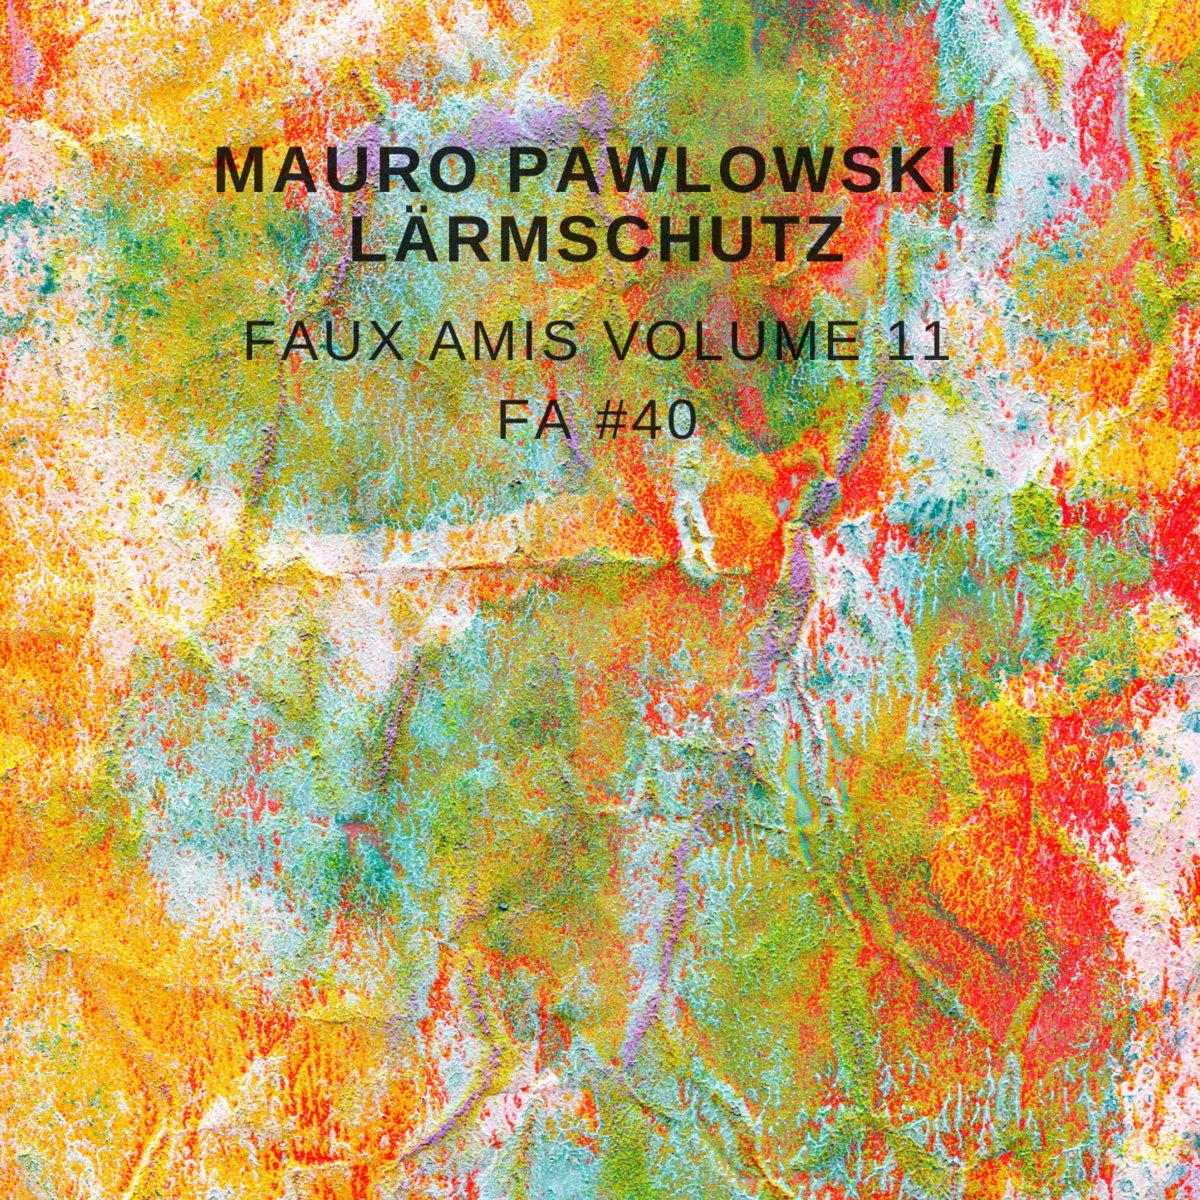 Mauro Pawlowski and Lärmschutz - Faux Amis vol. 9